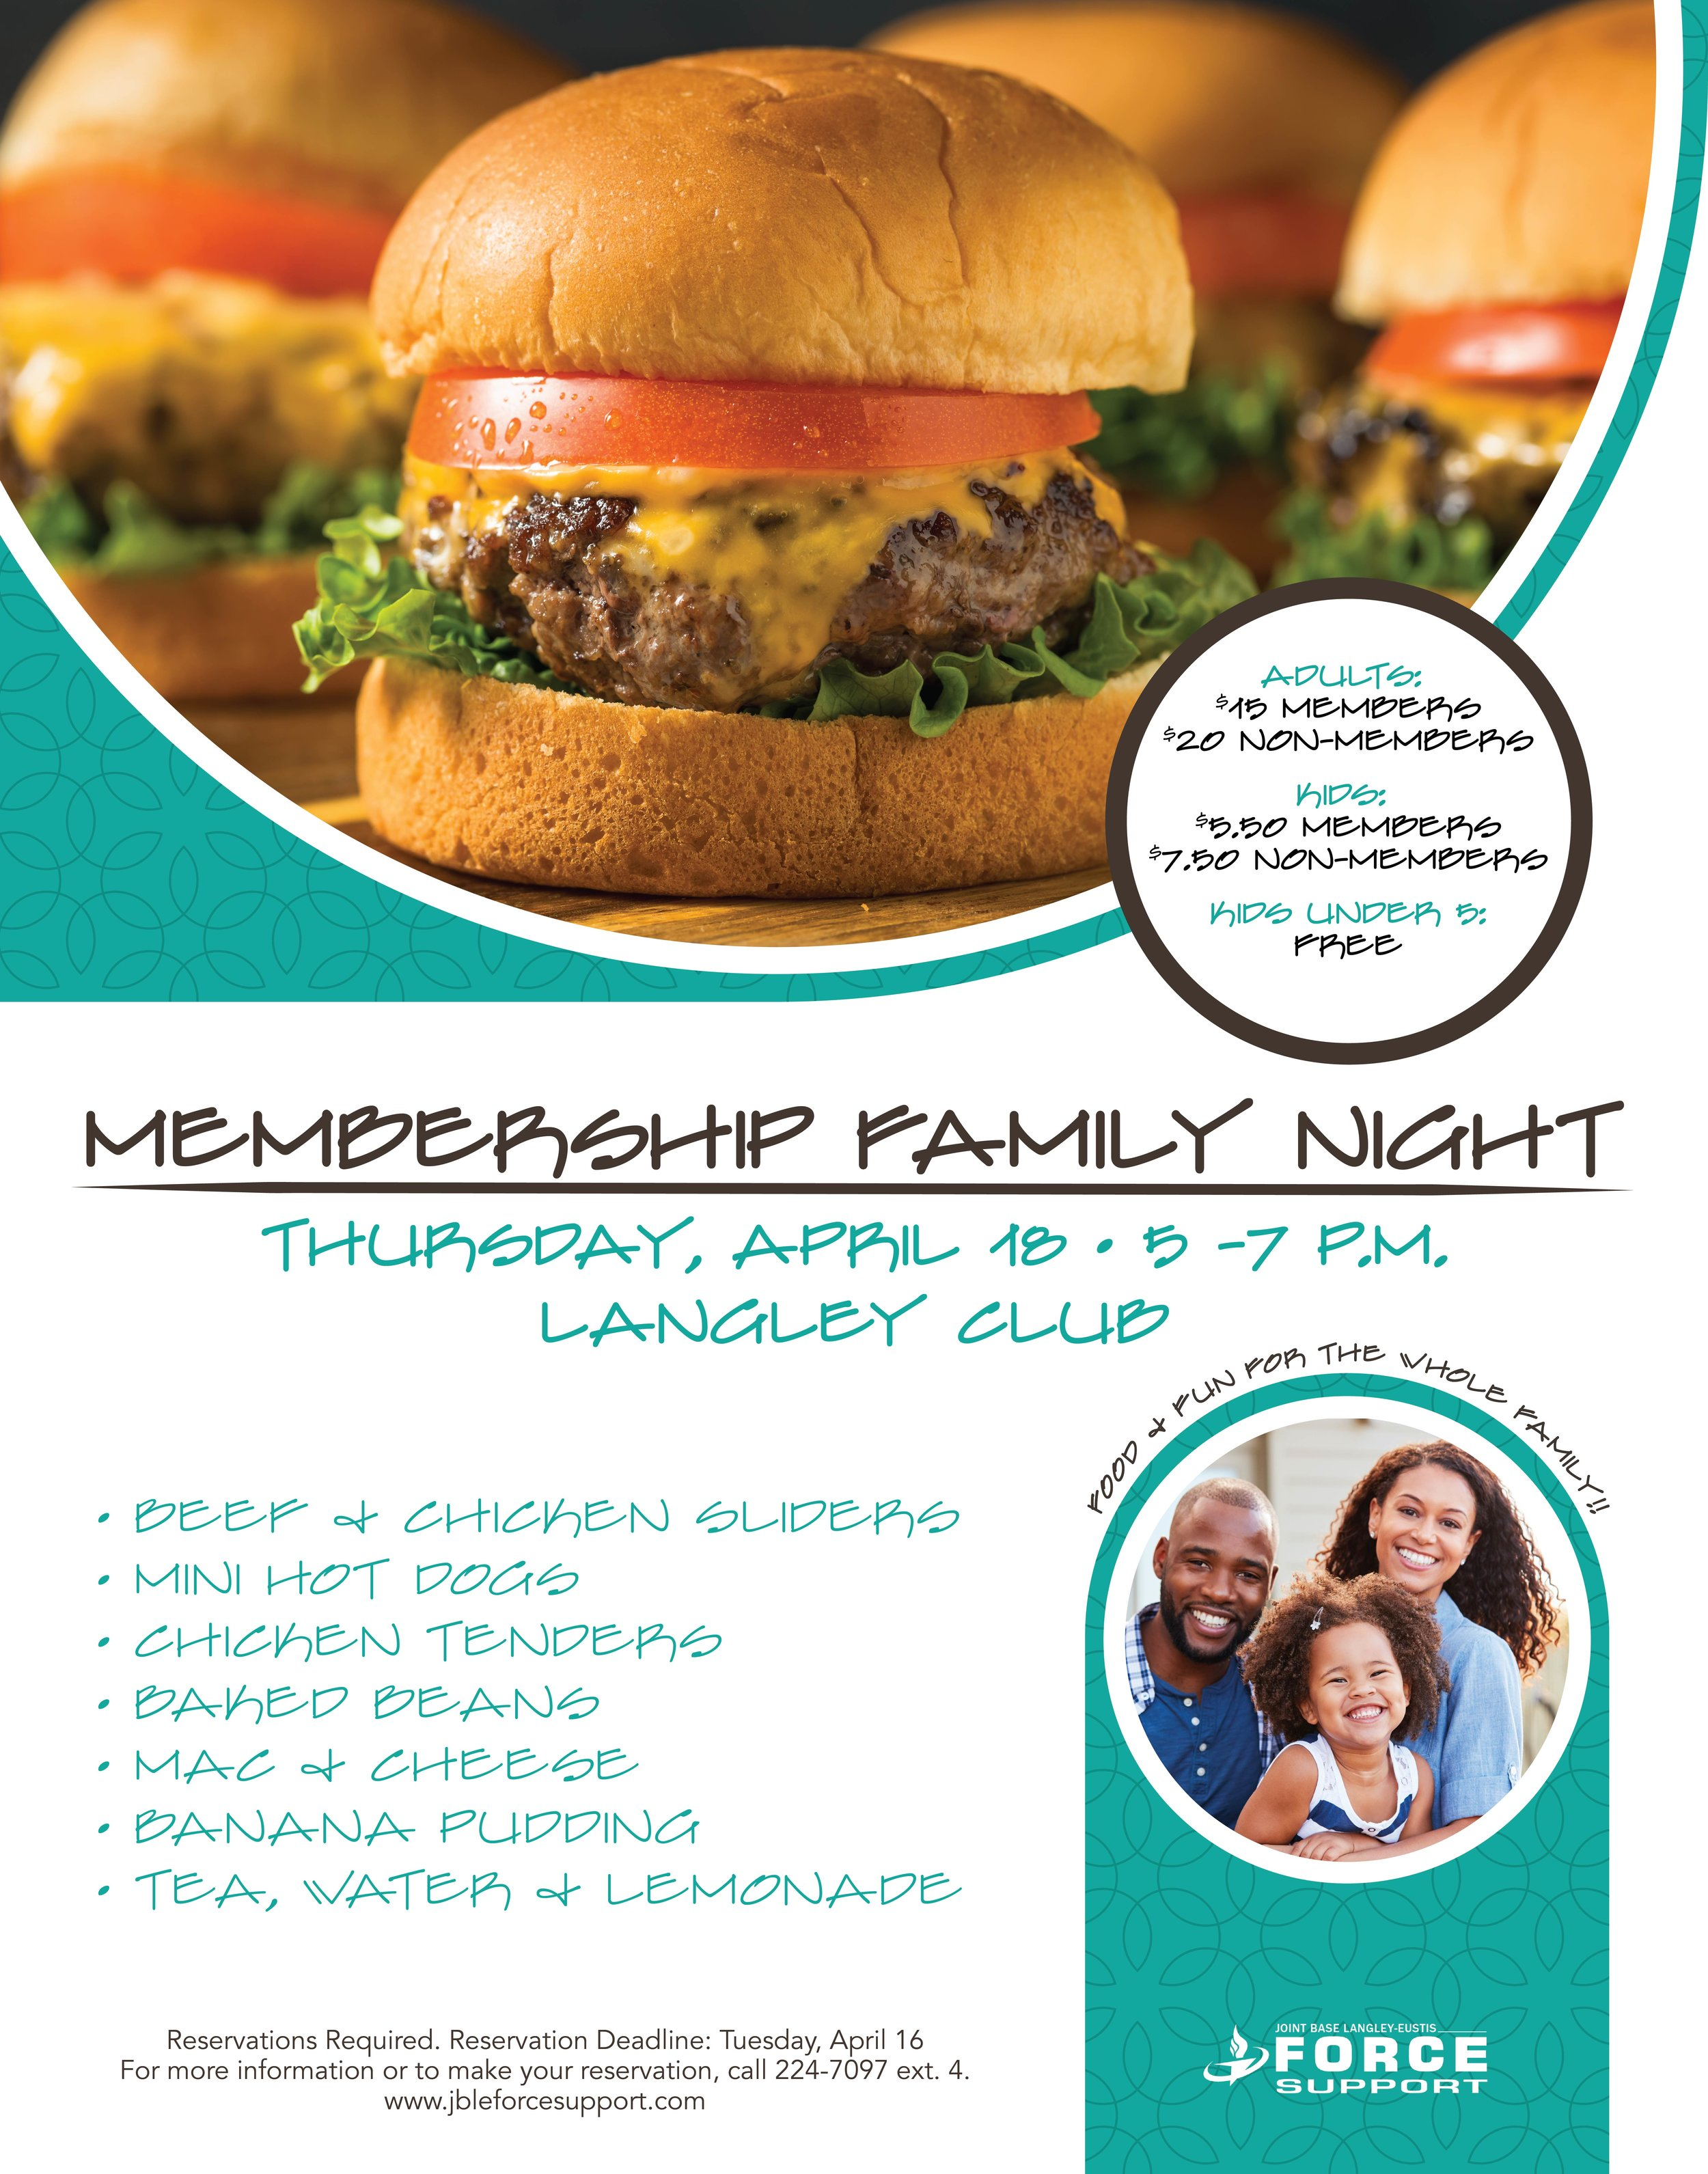 04-19 Membership Family Night.jpg